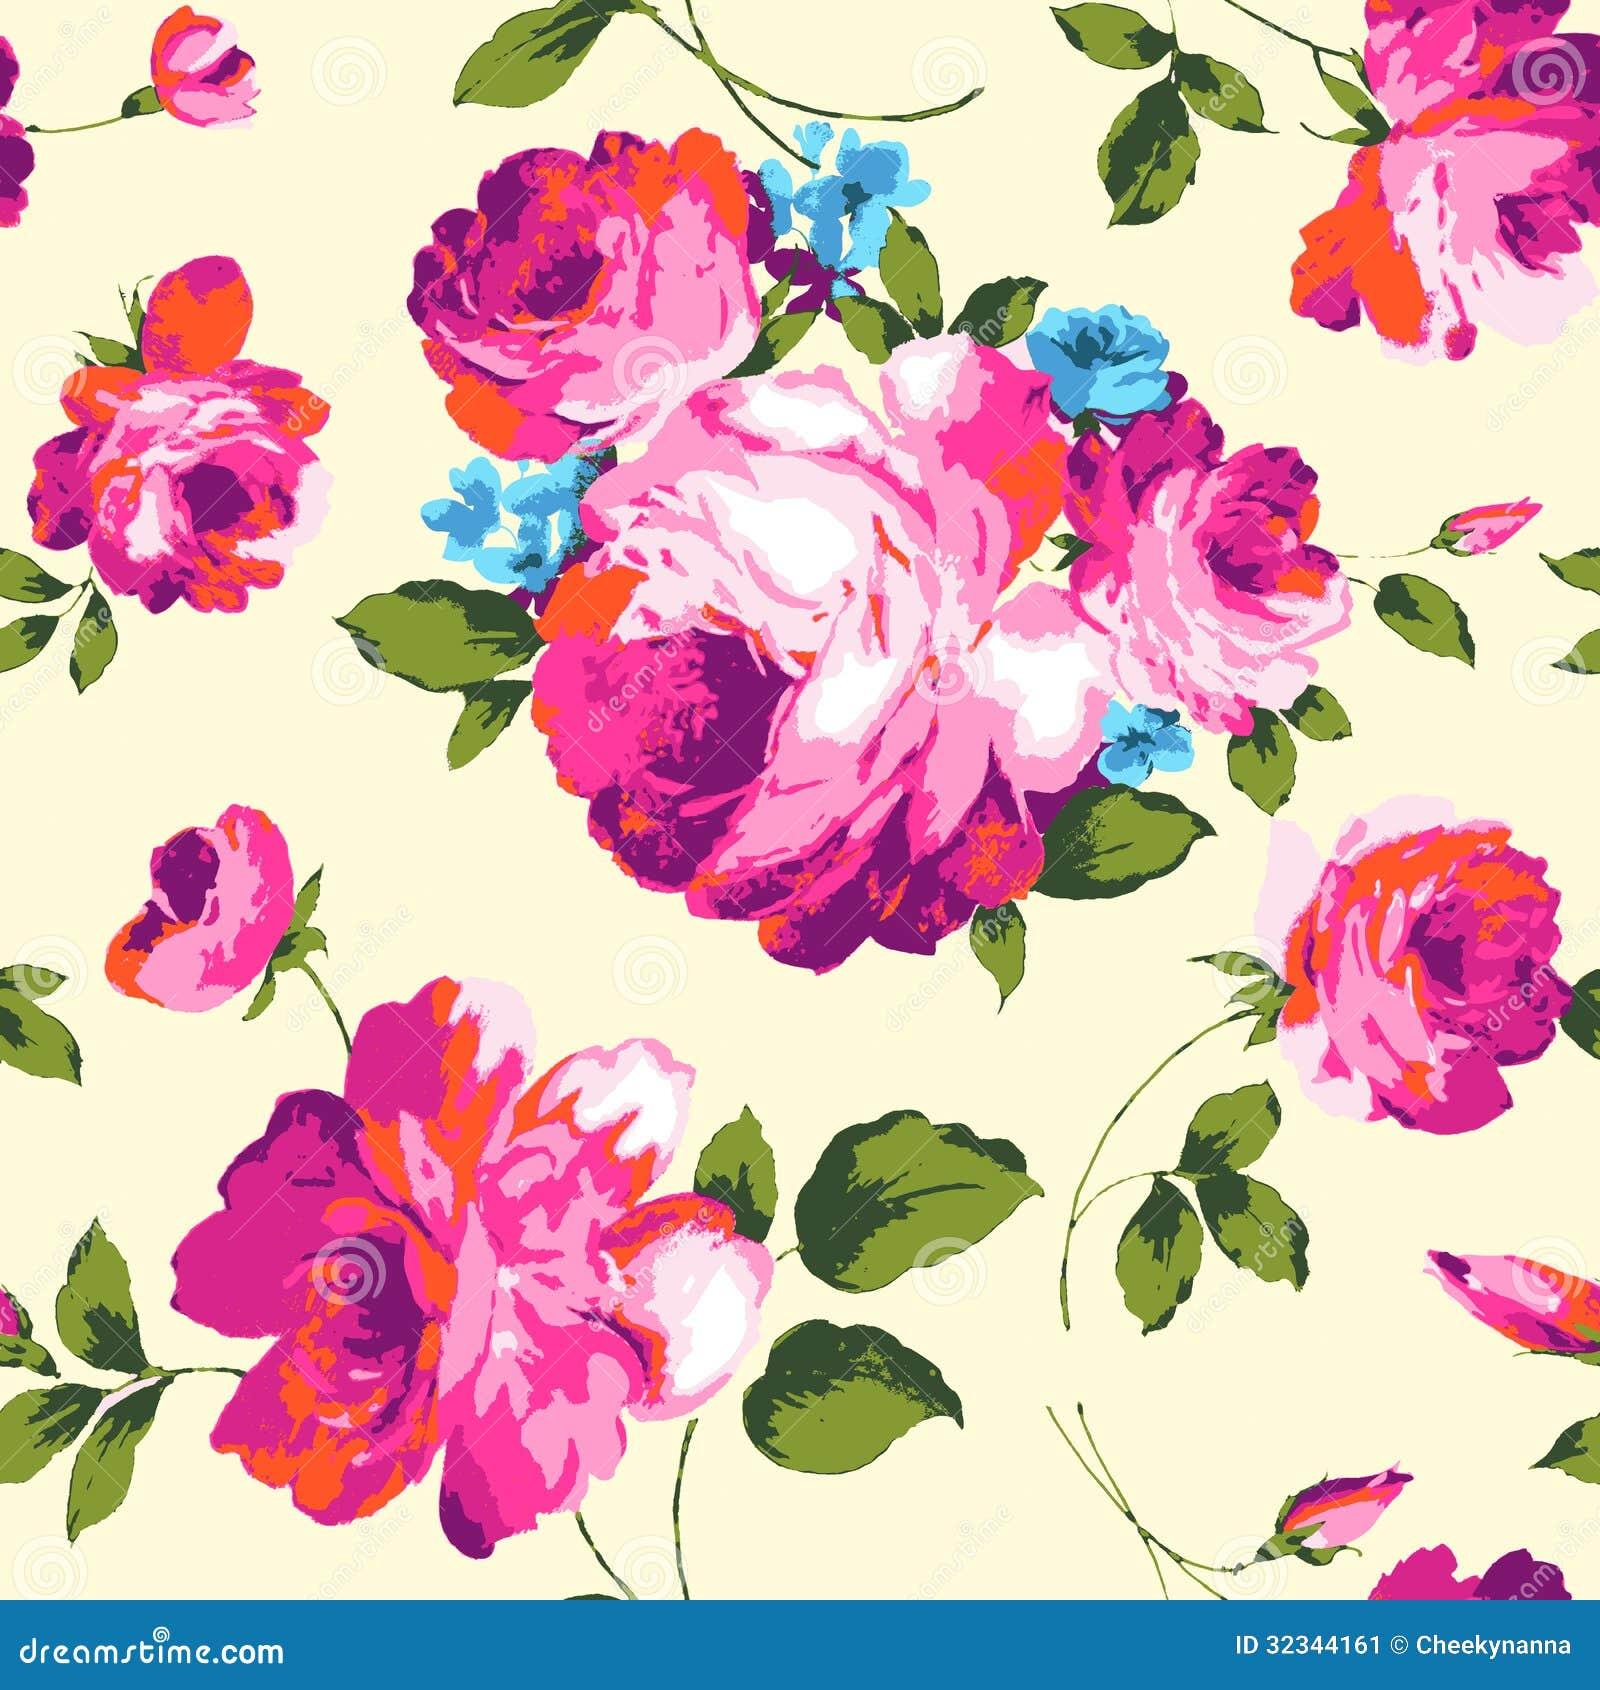 Fancy roses stock image image 32344161 - Big rose flower wallpaper ...